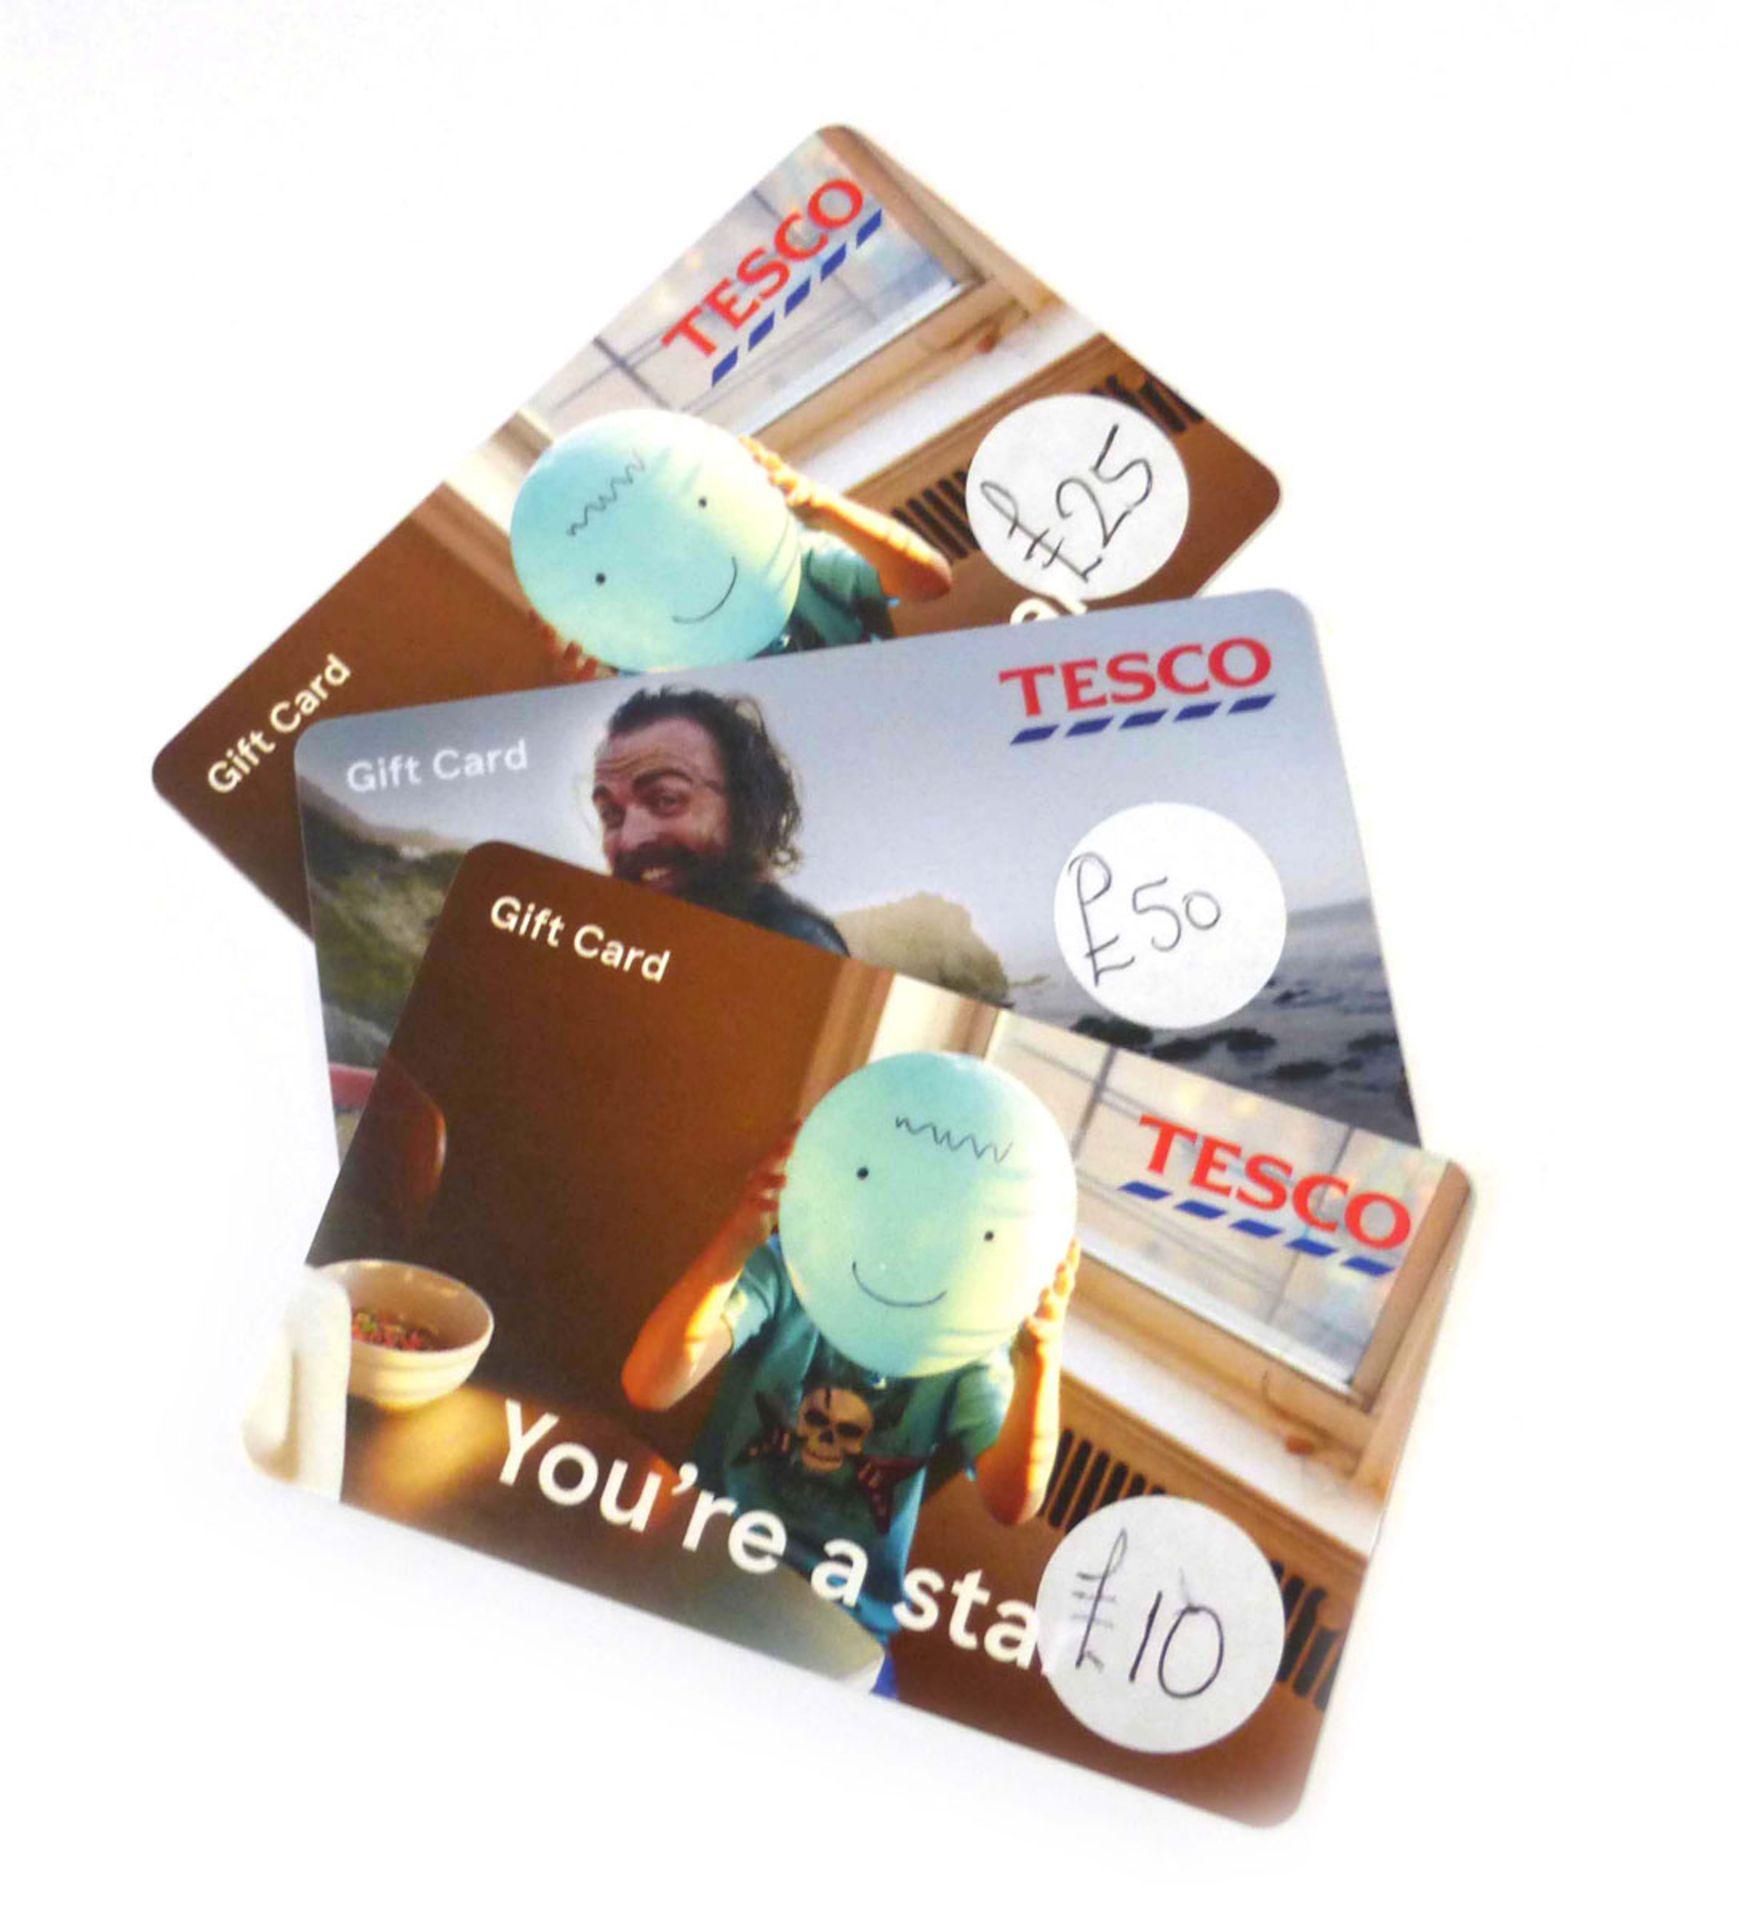 Tesco (x3) - Total face value £85